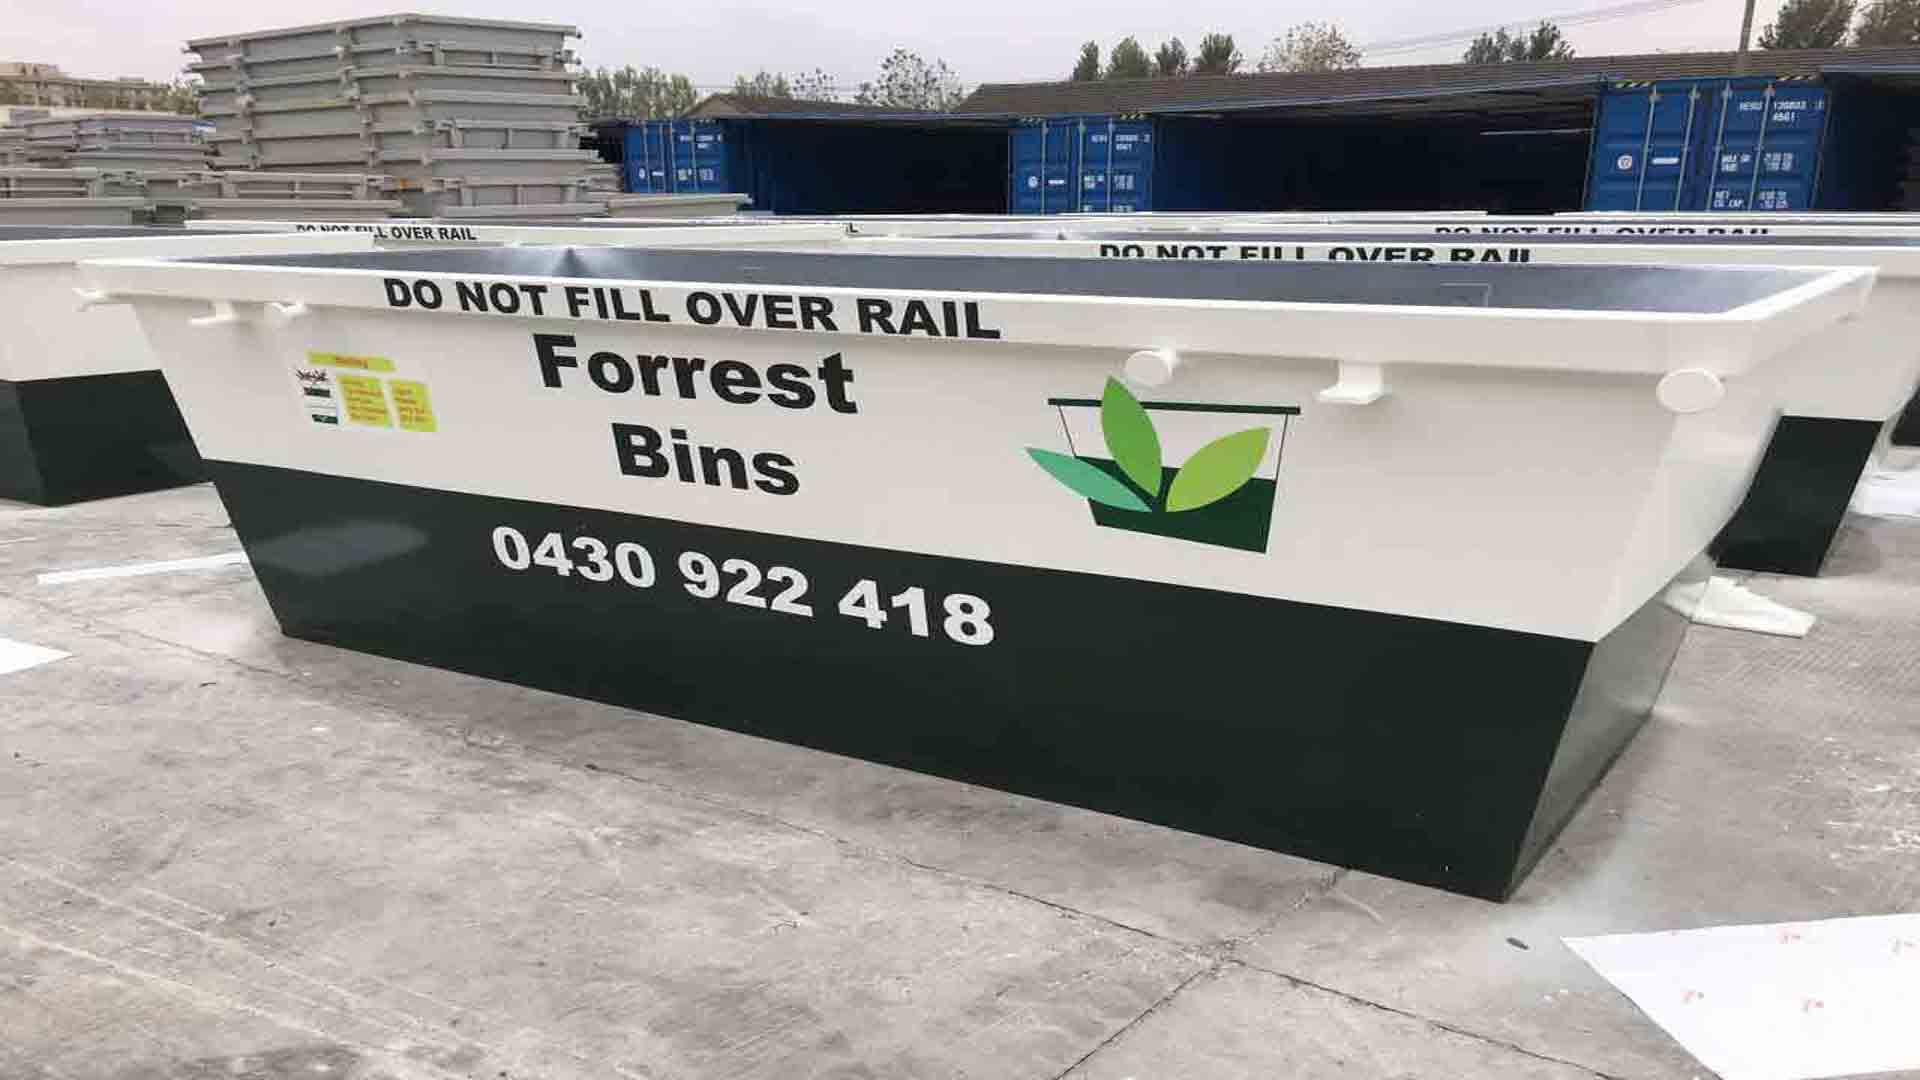 Forrest bins Forrest bins for brisbane 6-Cubic-Meter-Bin-3